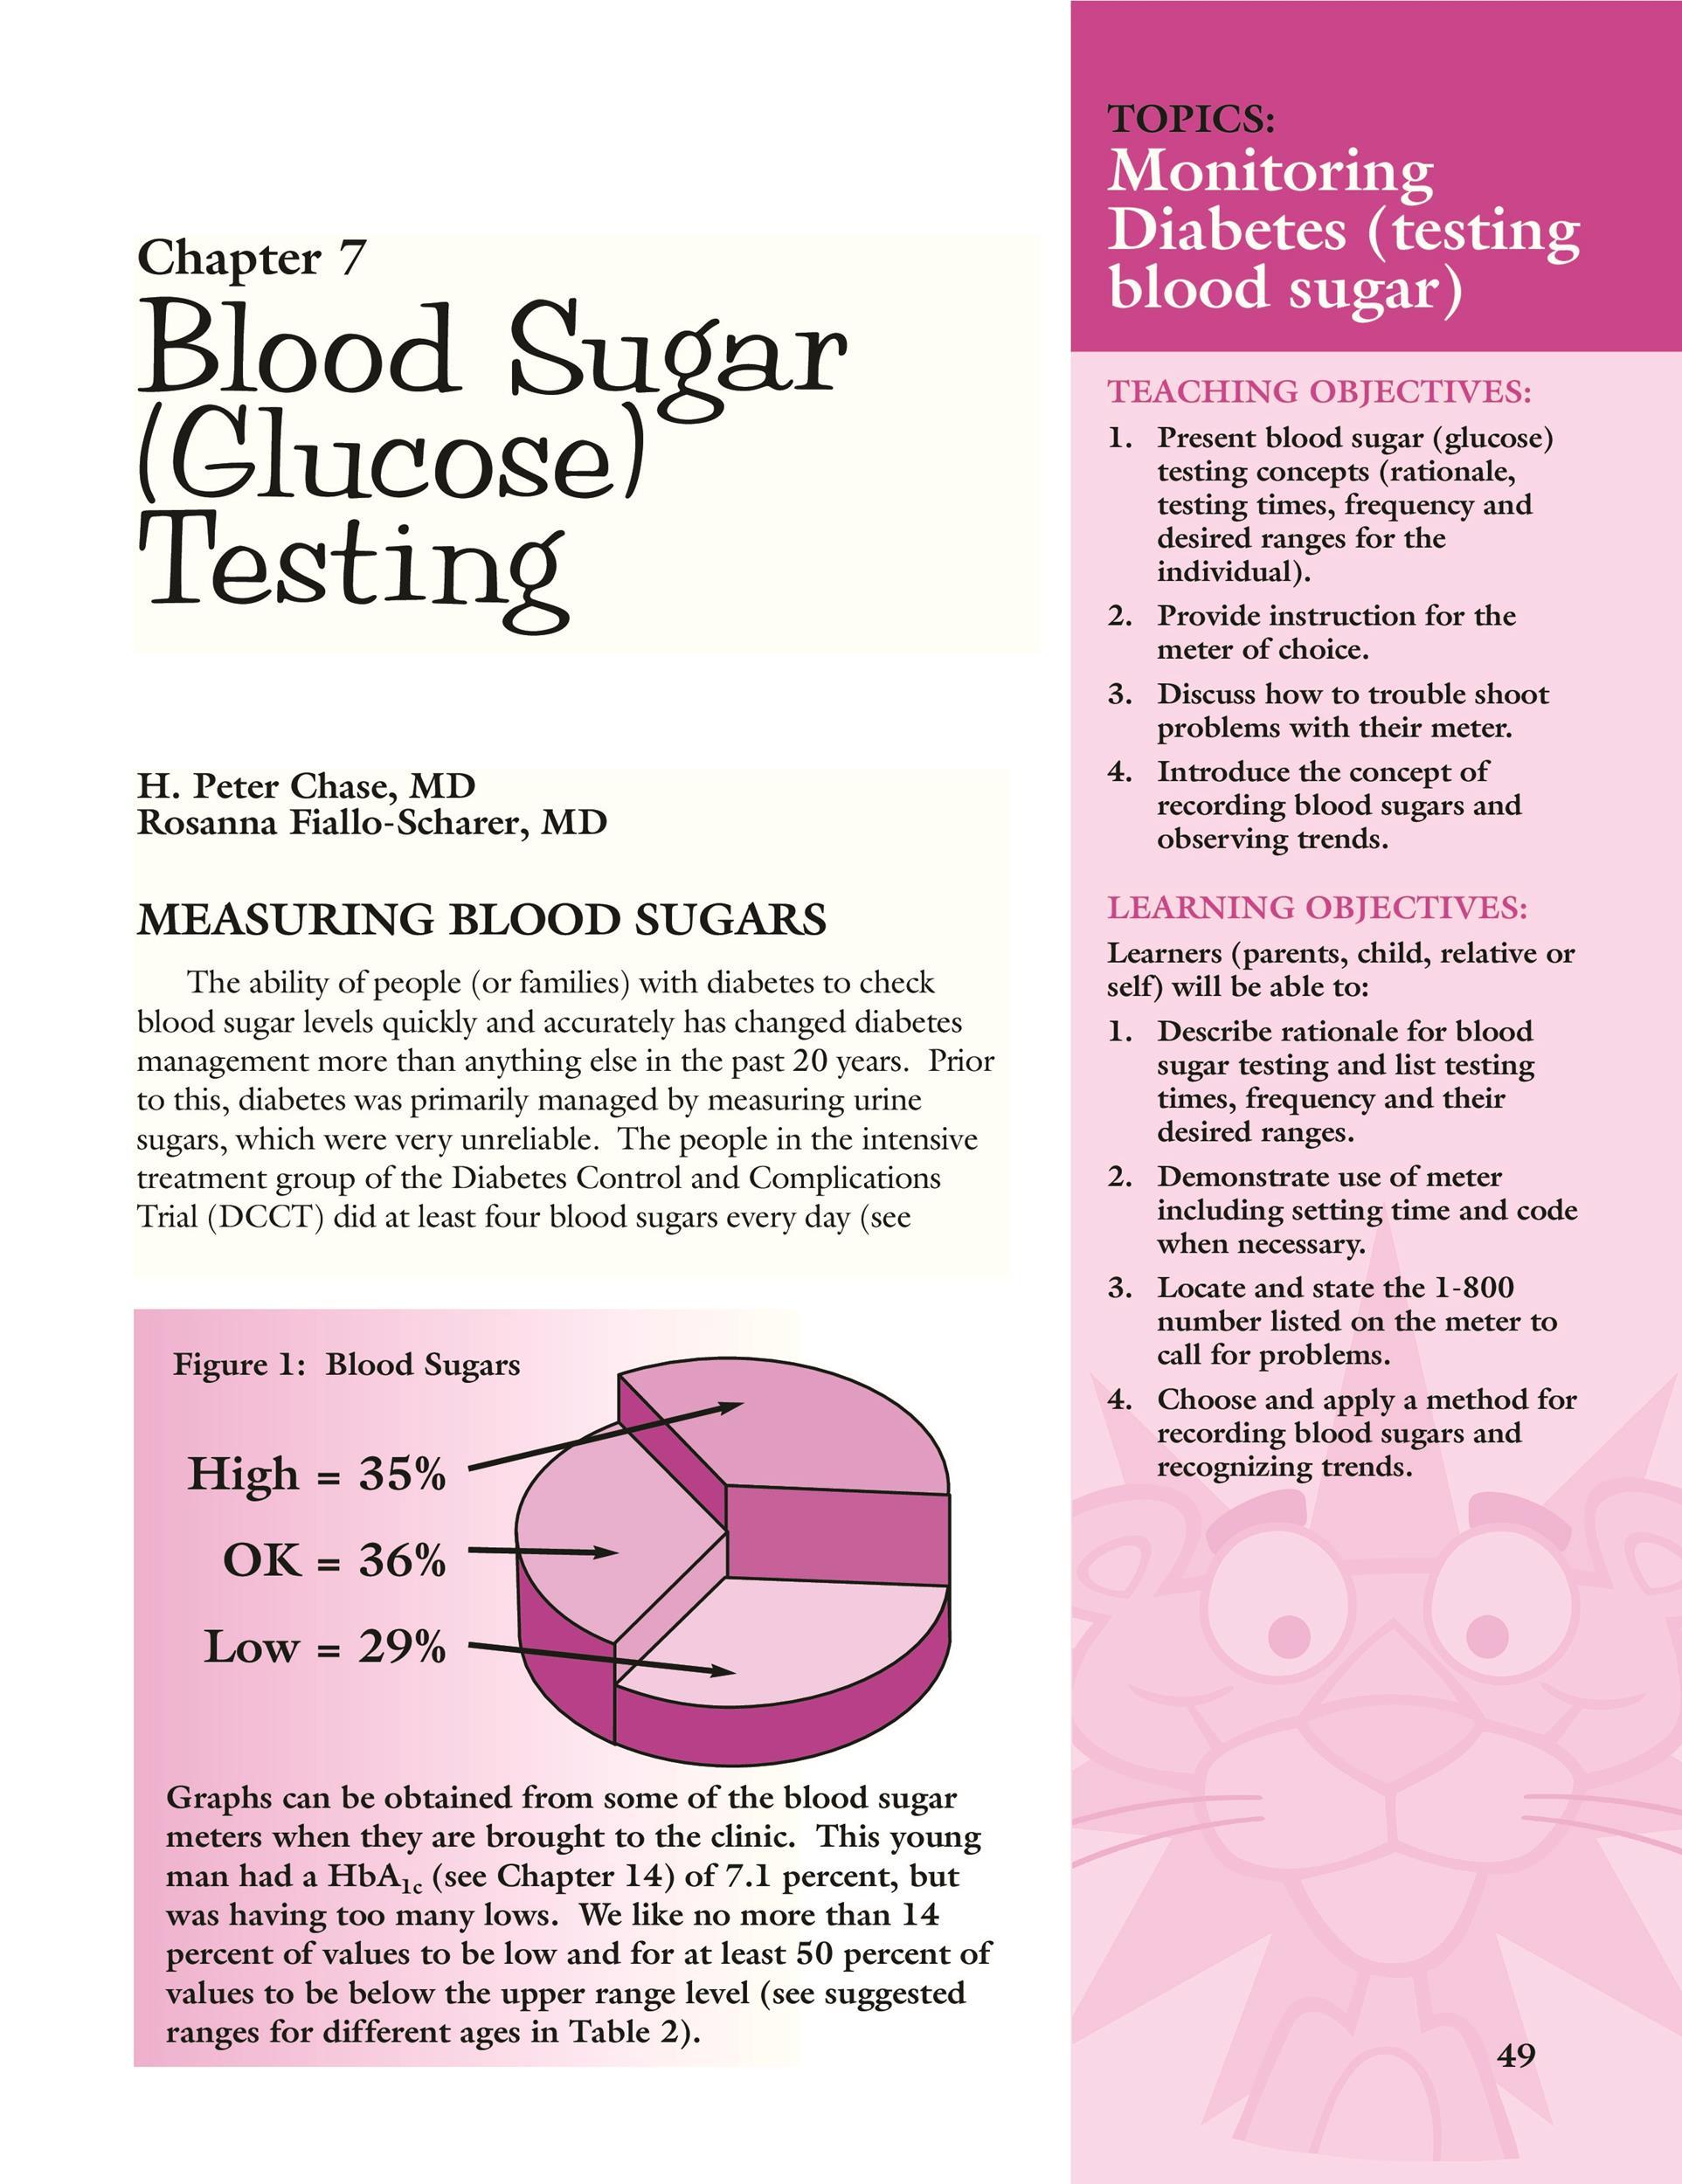 25 Printable Blood Sugar Charts Normal High Low Á… Templatelab